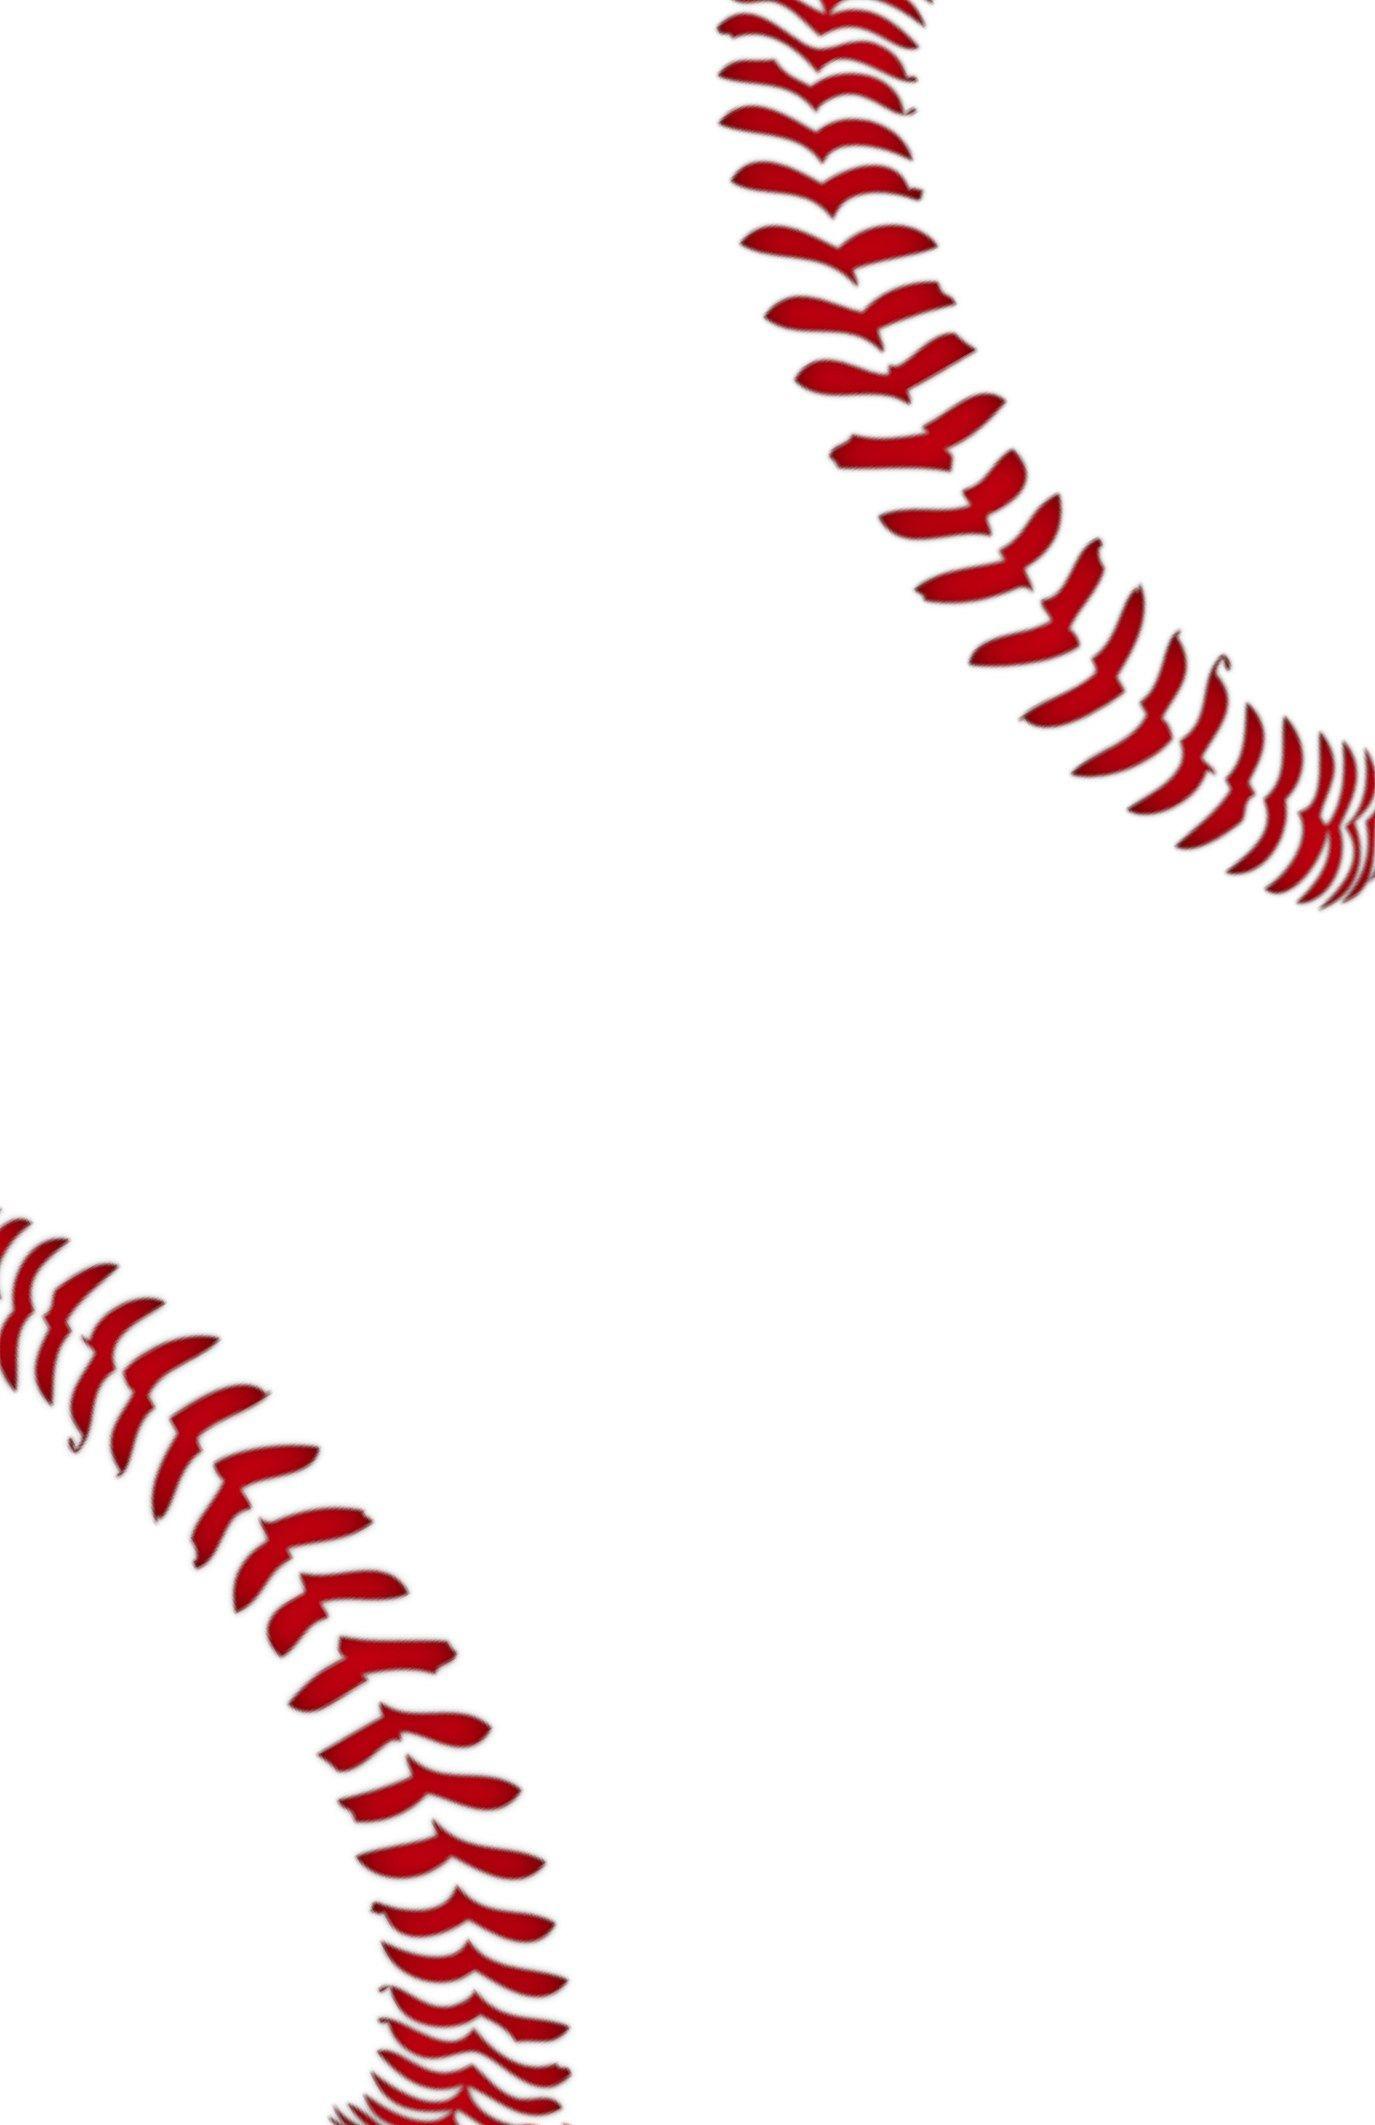 Baseball Party Invitations Free Printable   Party Ideas   Baseball - Free Printable Baseball Stationery